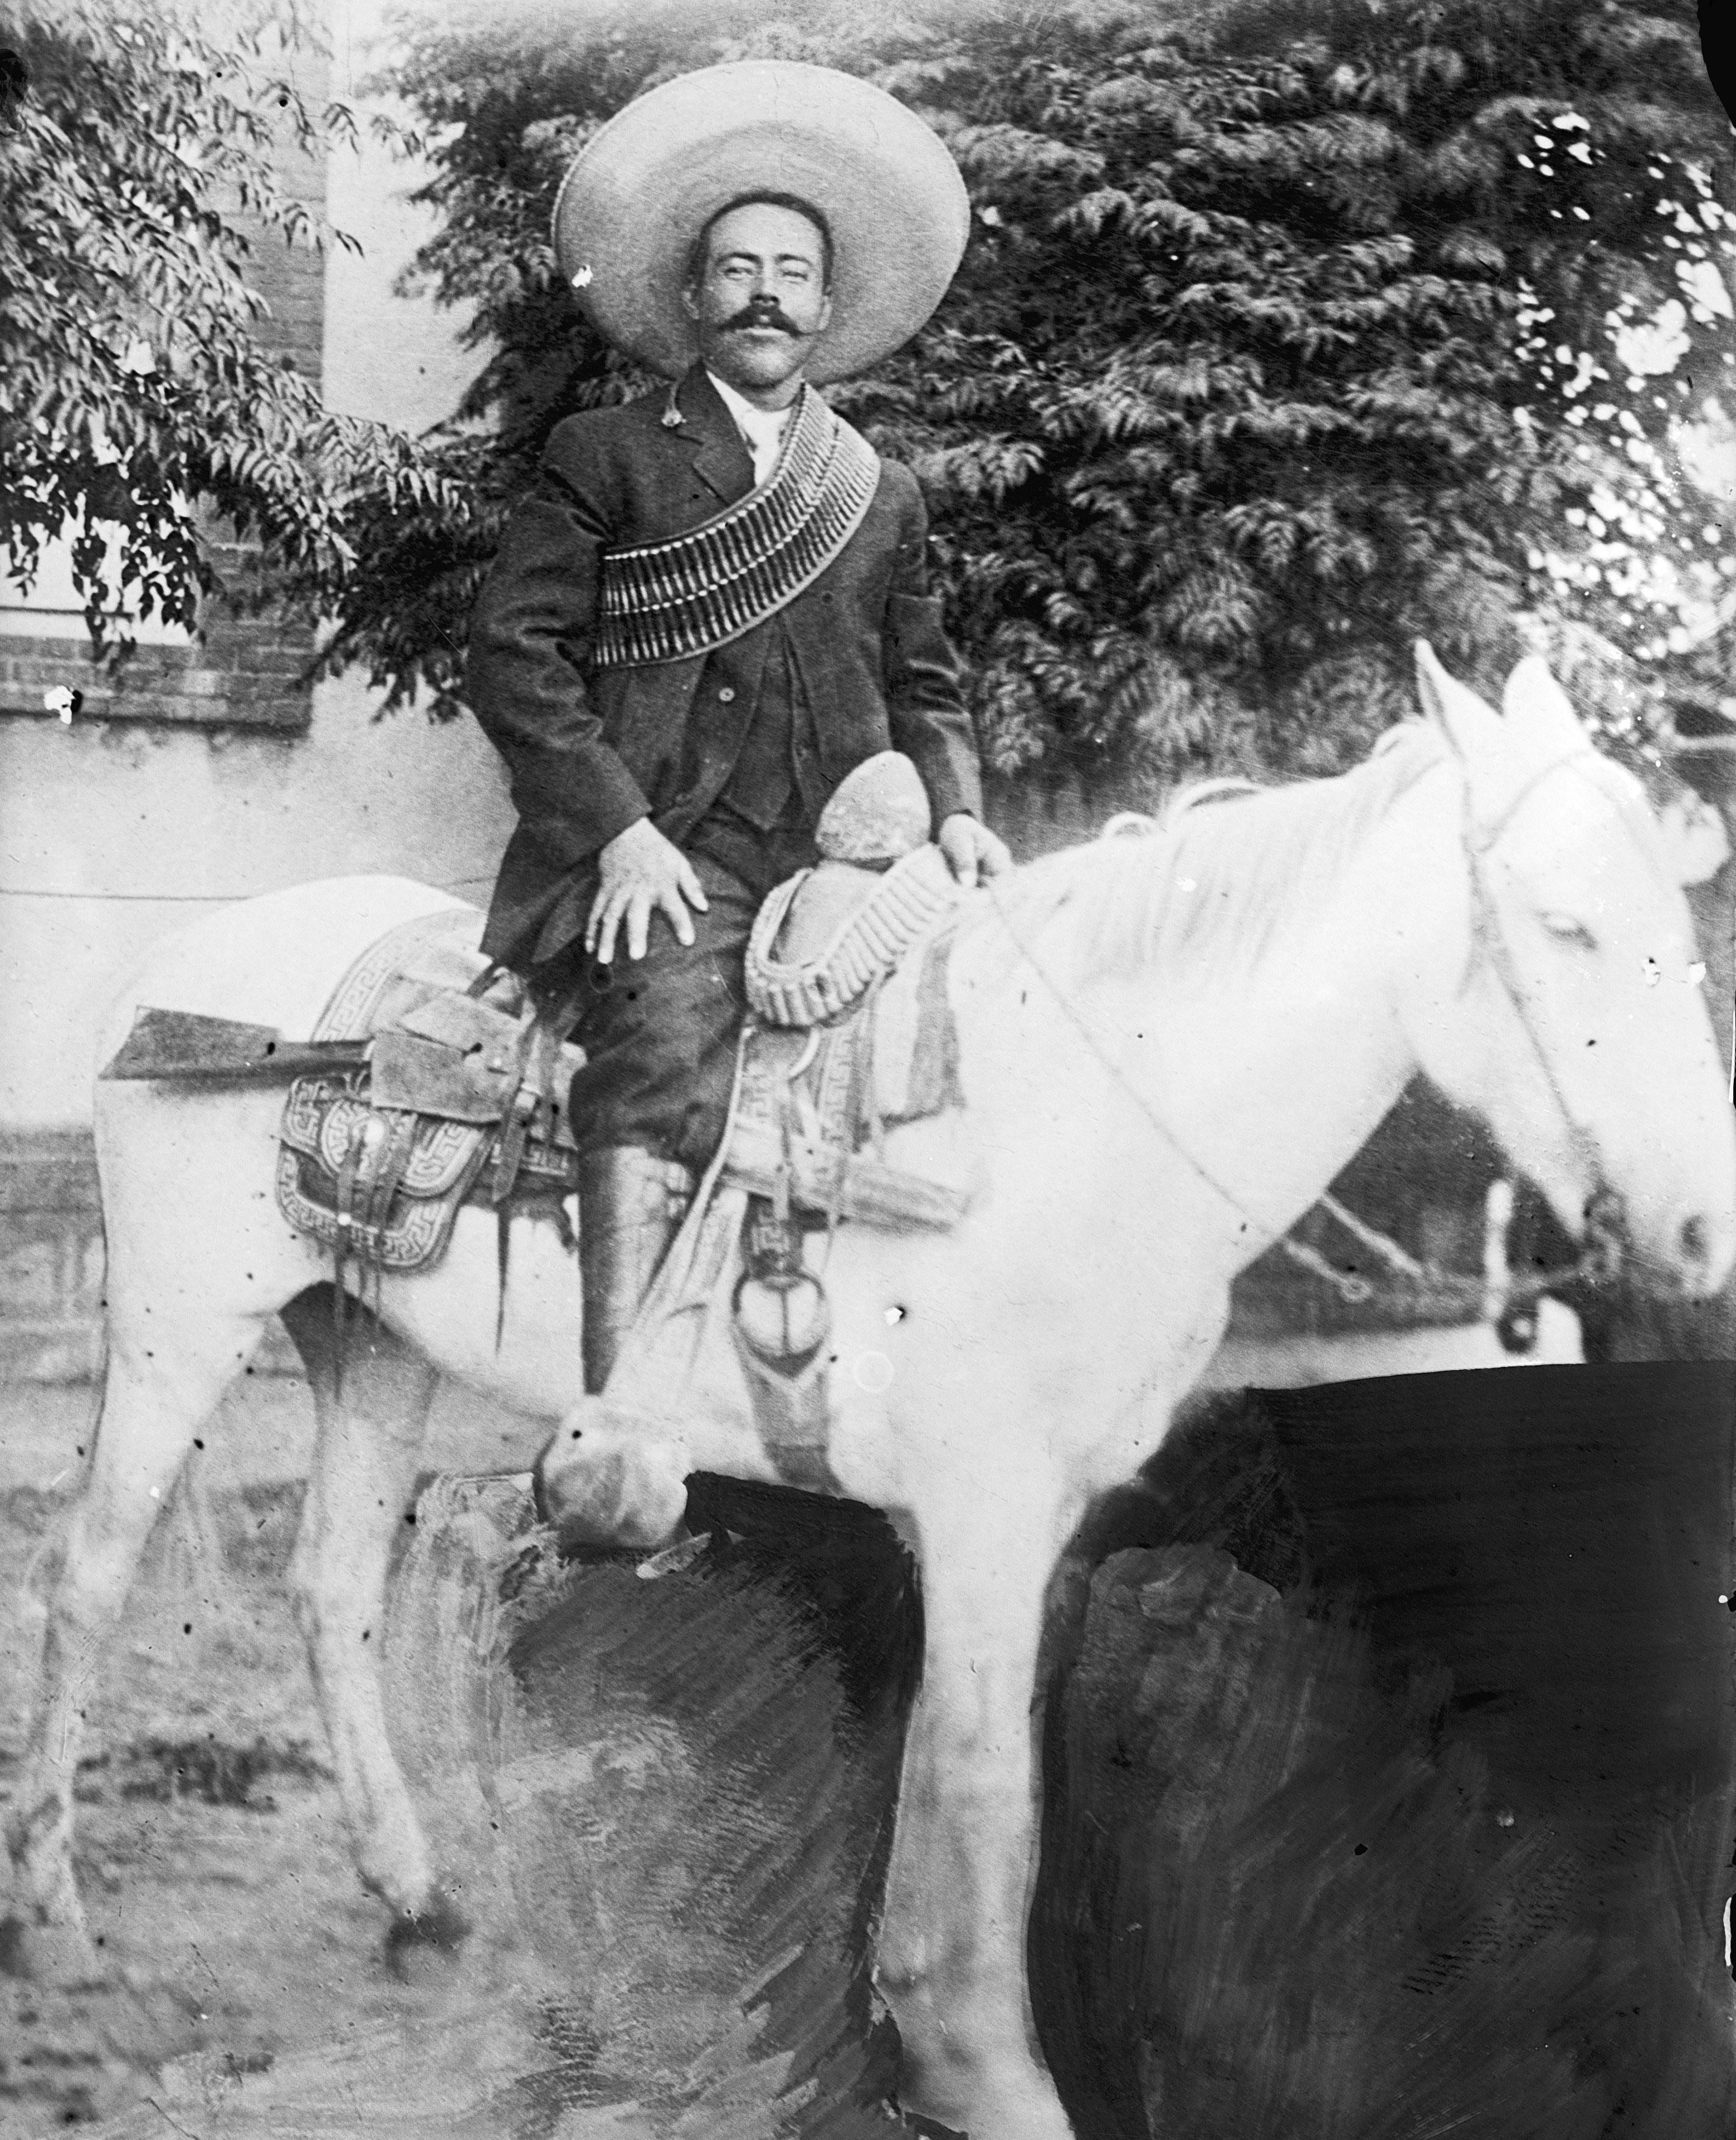 Pancho Villa on horseback (undated photo, between 1908 and 1919)